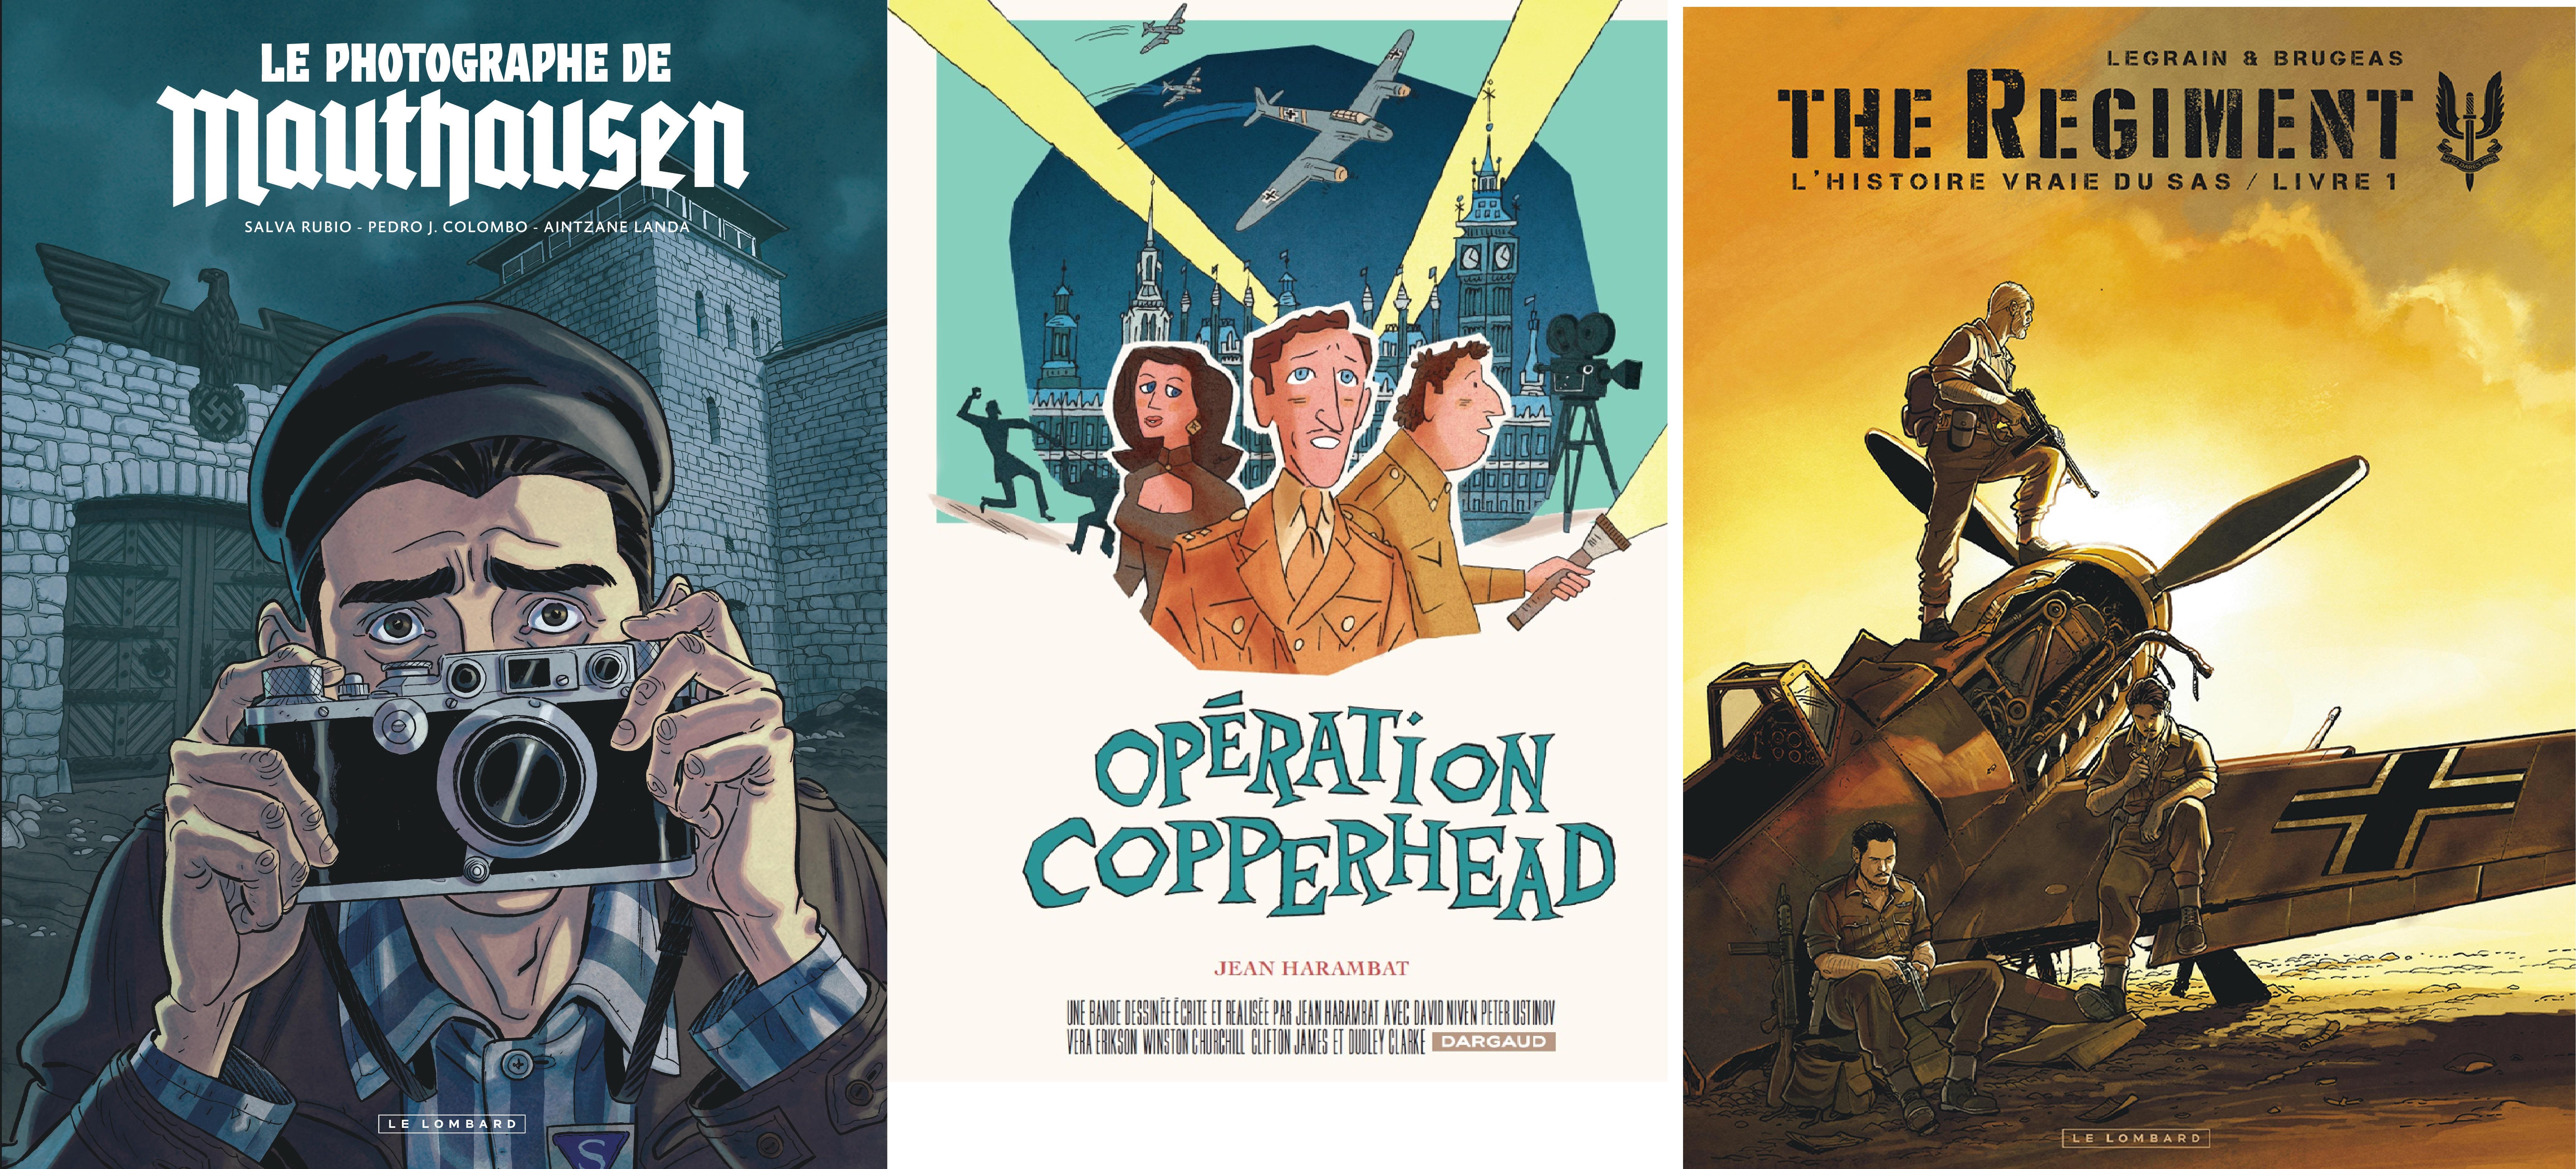 Le Photographe De Mauthausen Operation Copperhead The